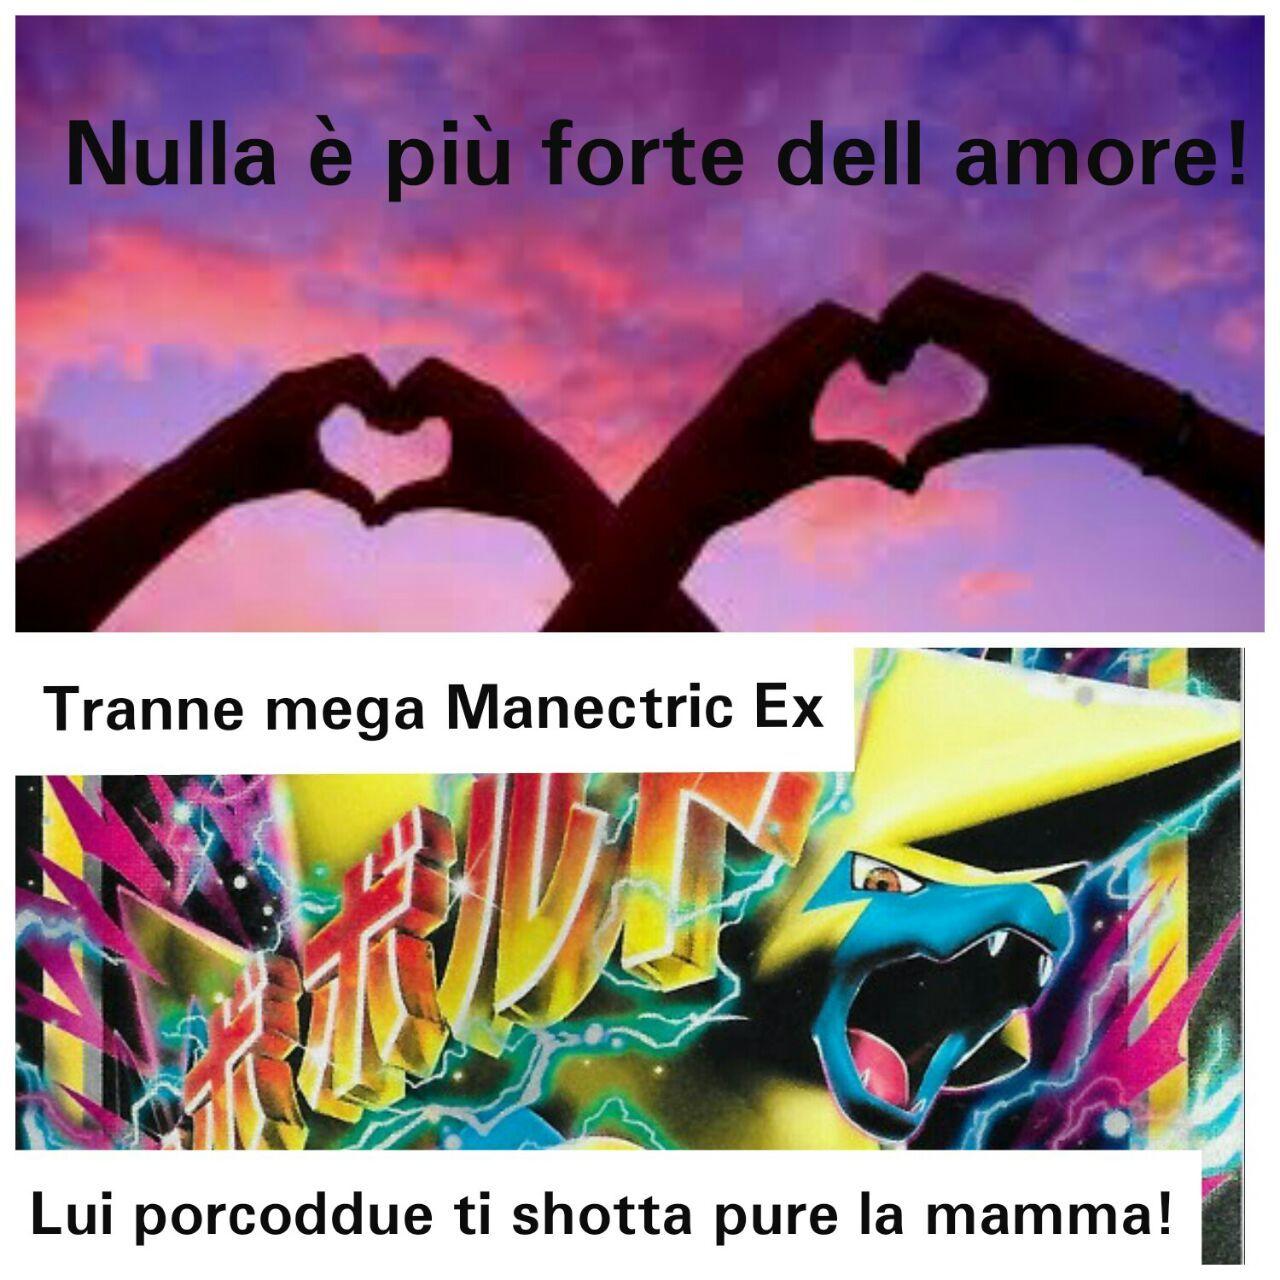 #MammaTiVoglioBene - meme